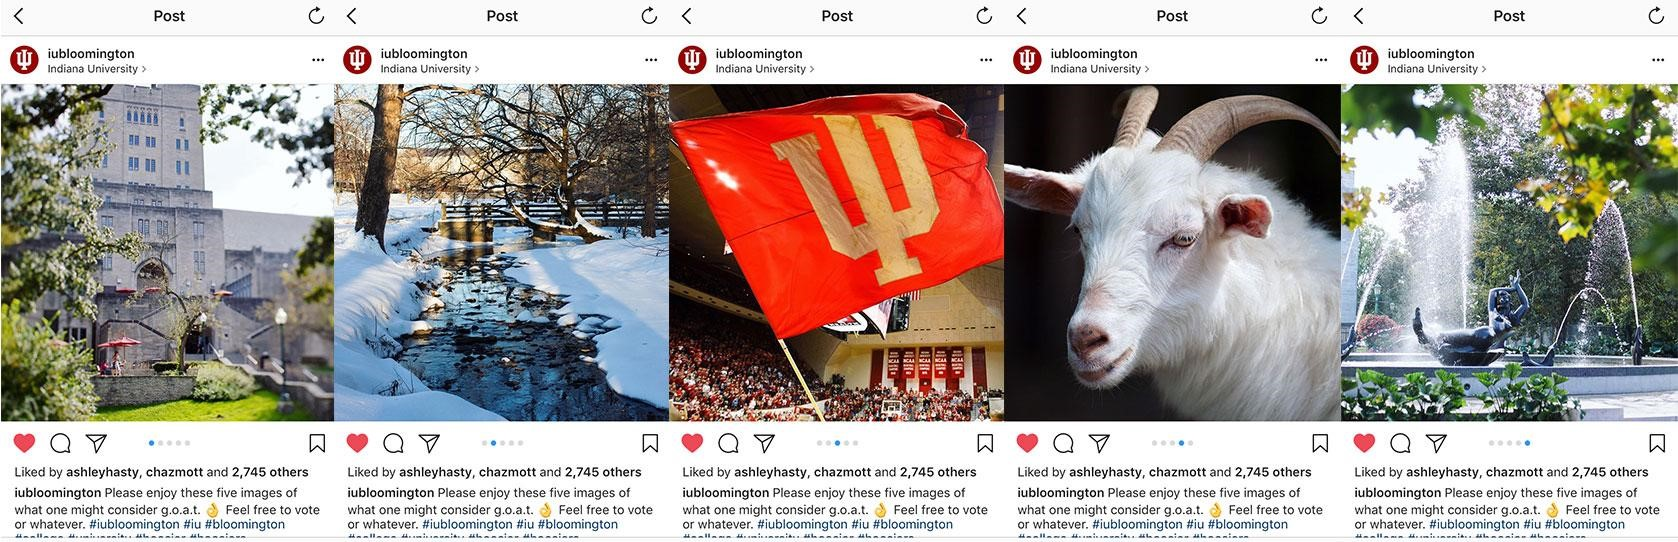 Indiana University Instagram slideshow